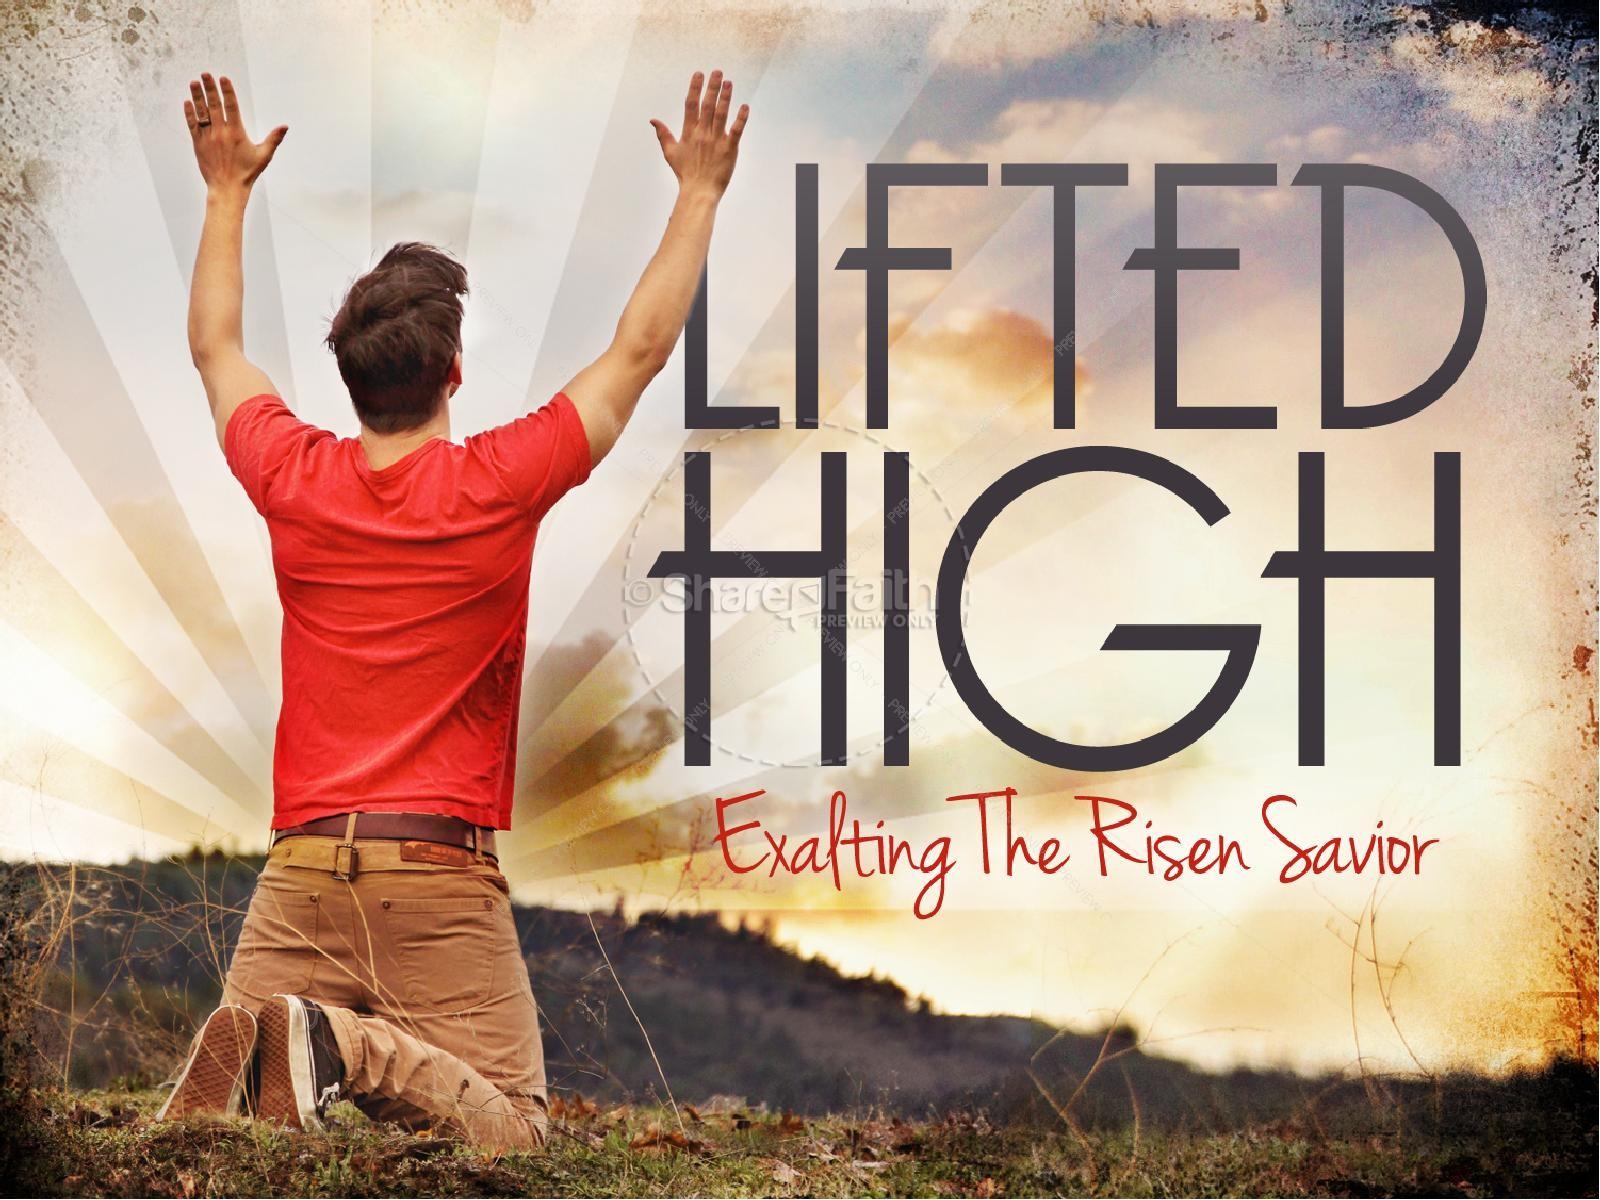 Exalted Easter PowerPoint Sermon | slide 1